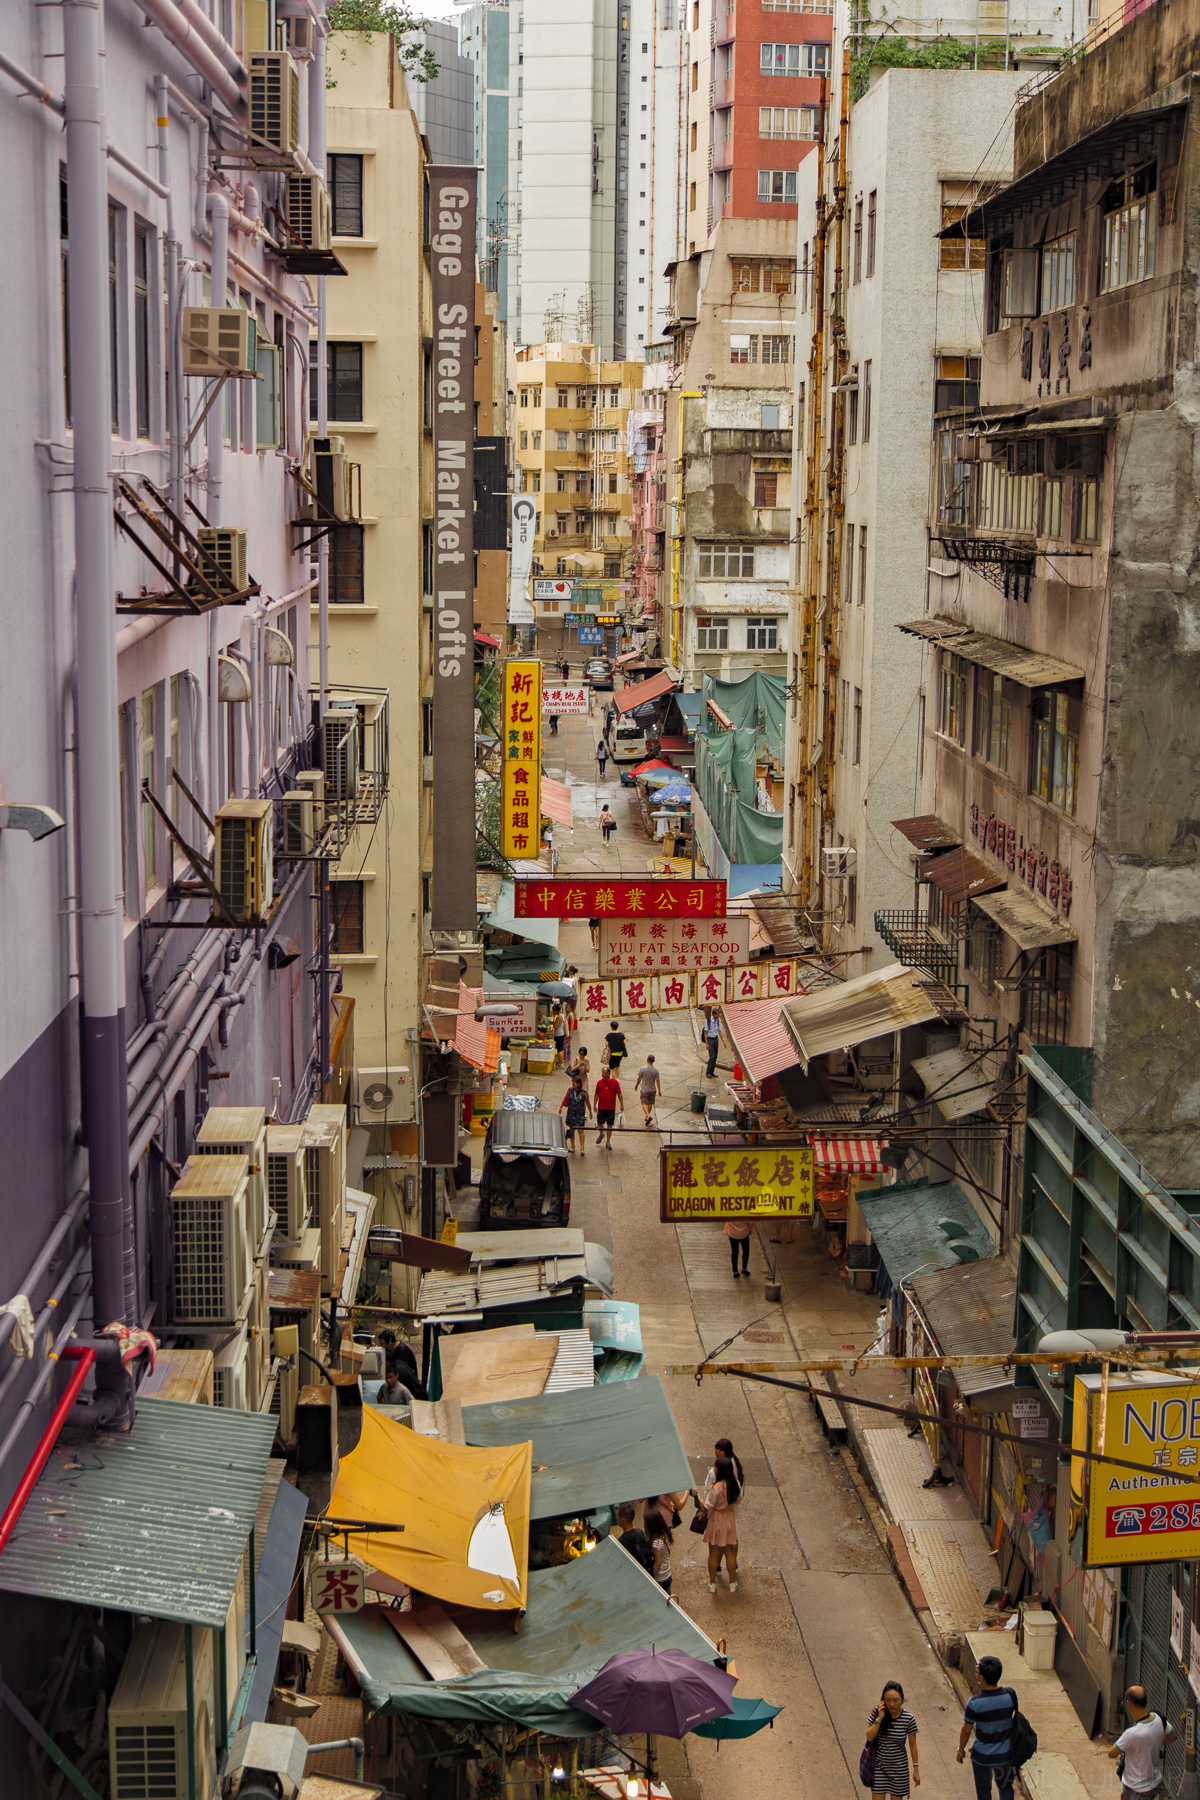 Hong Kong Island 3 Of 7 Photo Gallery Paul Saulnier